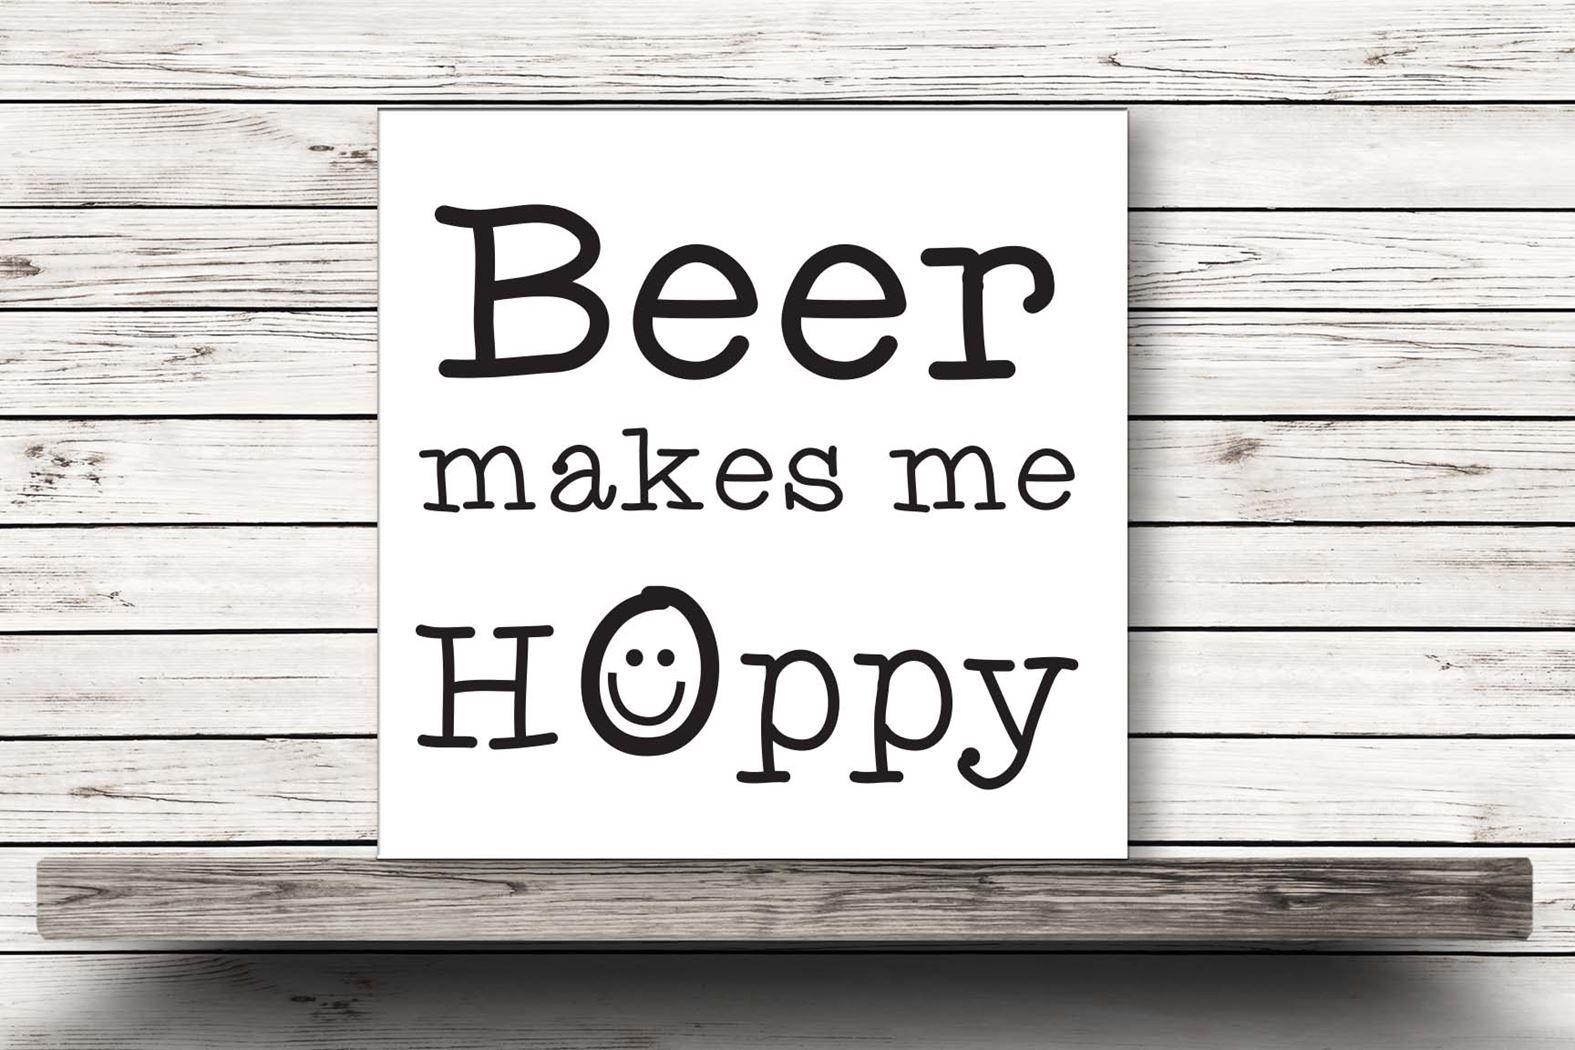 onderzetter wit - beer makes me hoppy